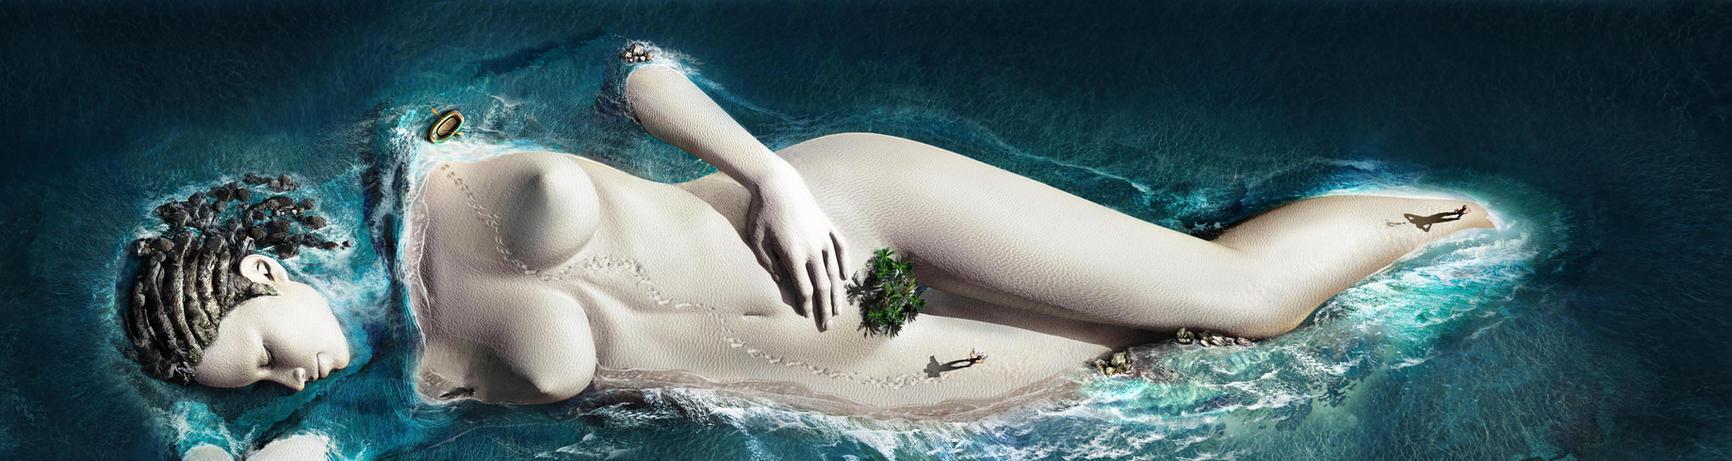 island by Jubran